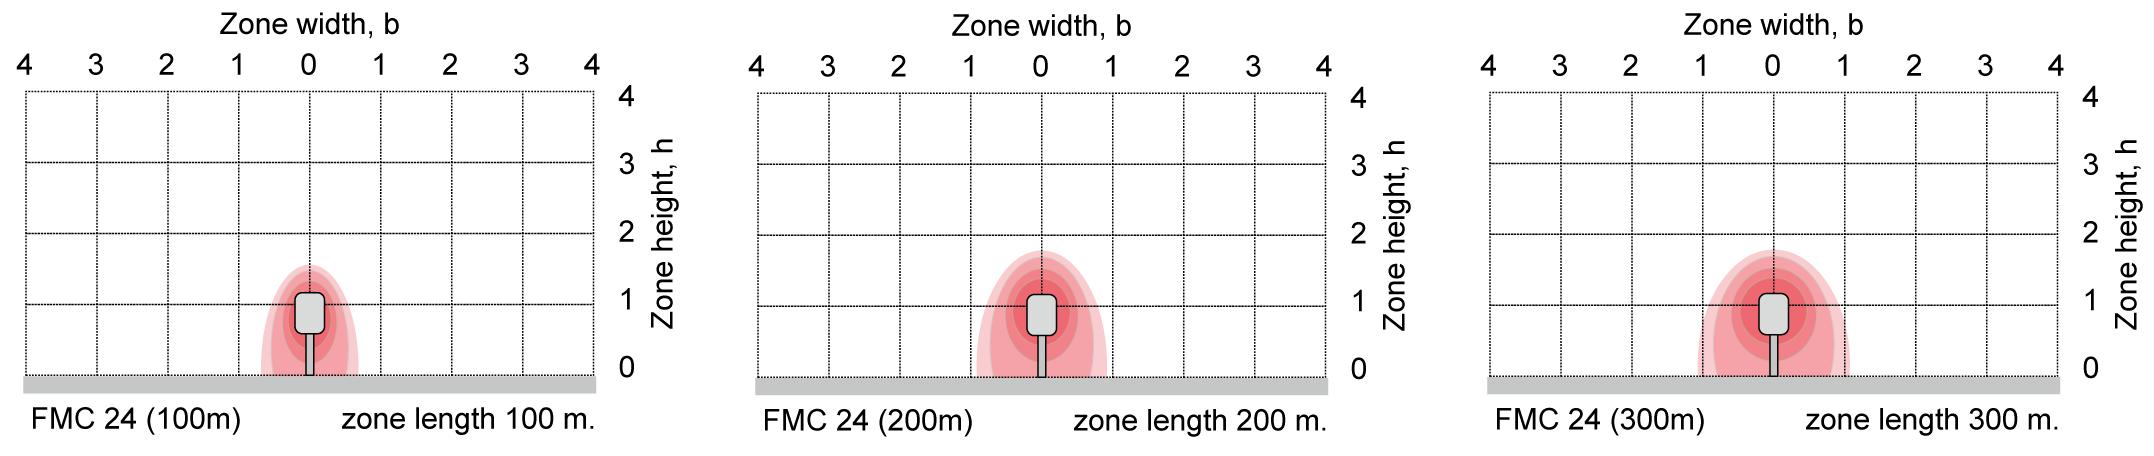 FMC 24 Pro schema